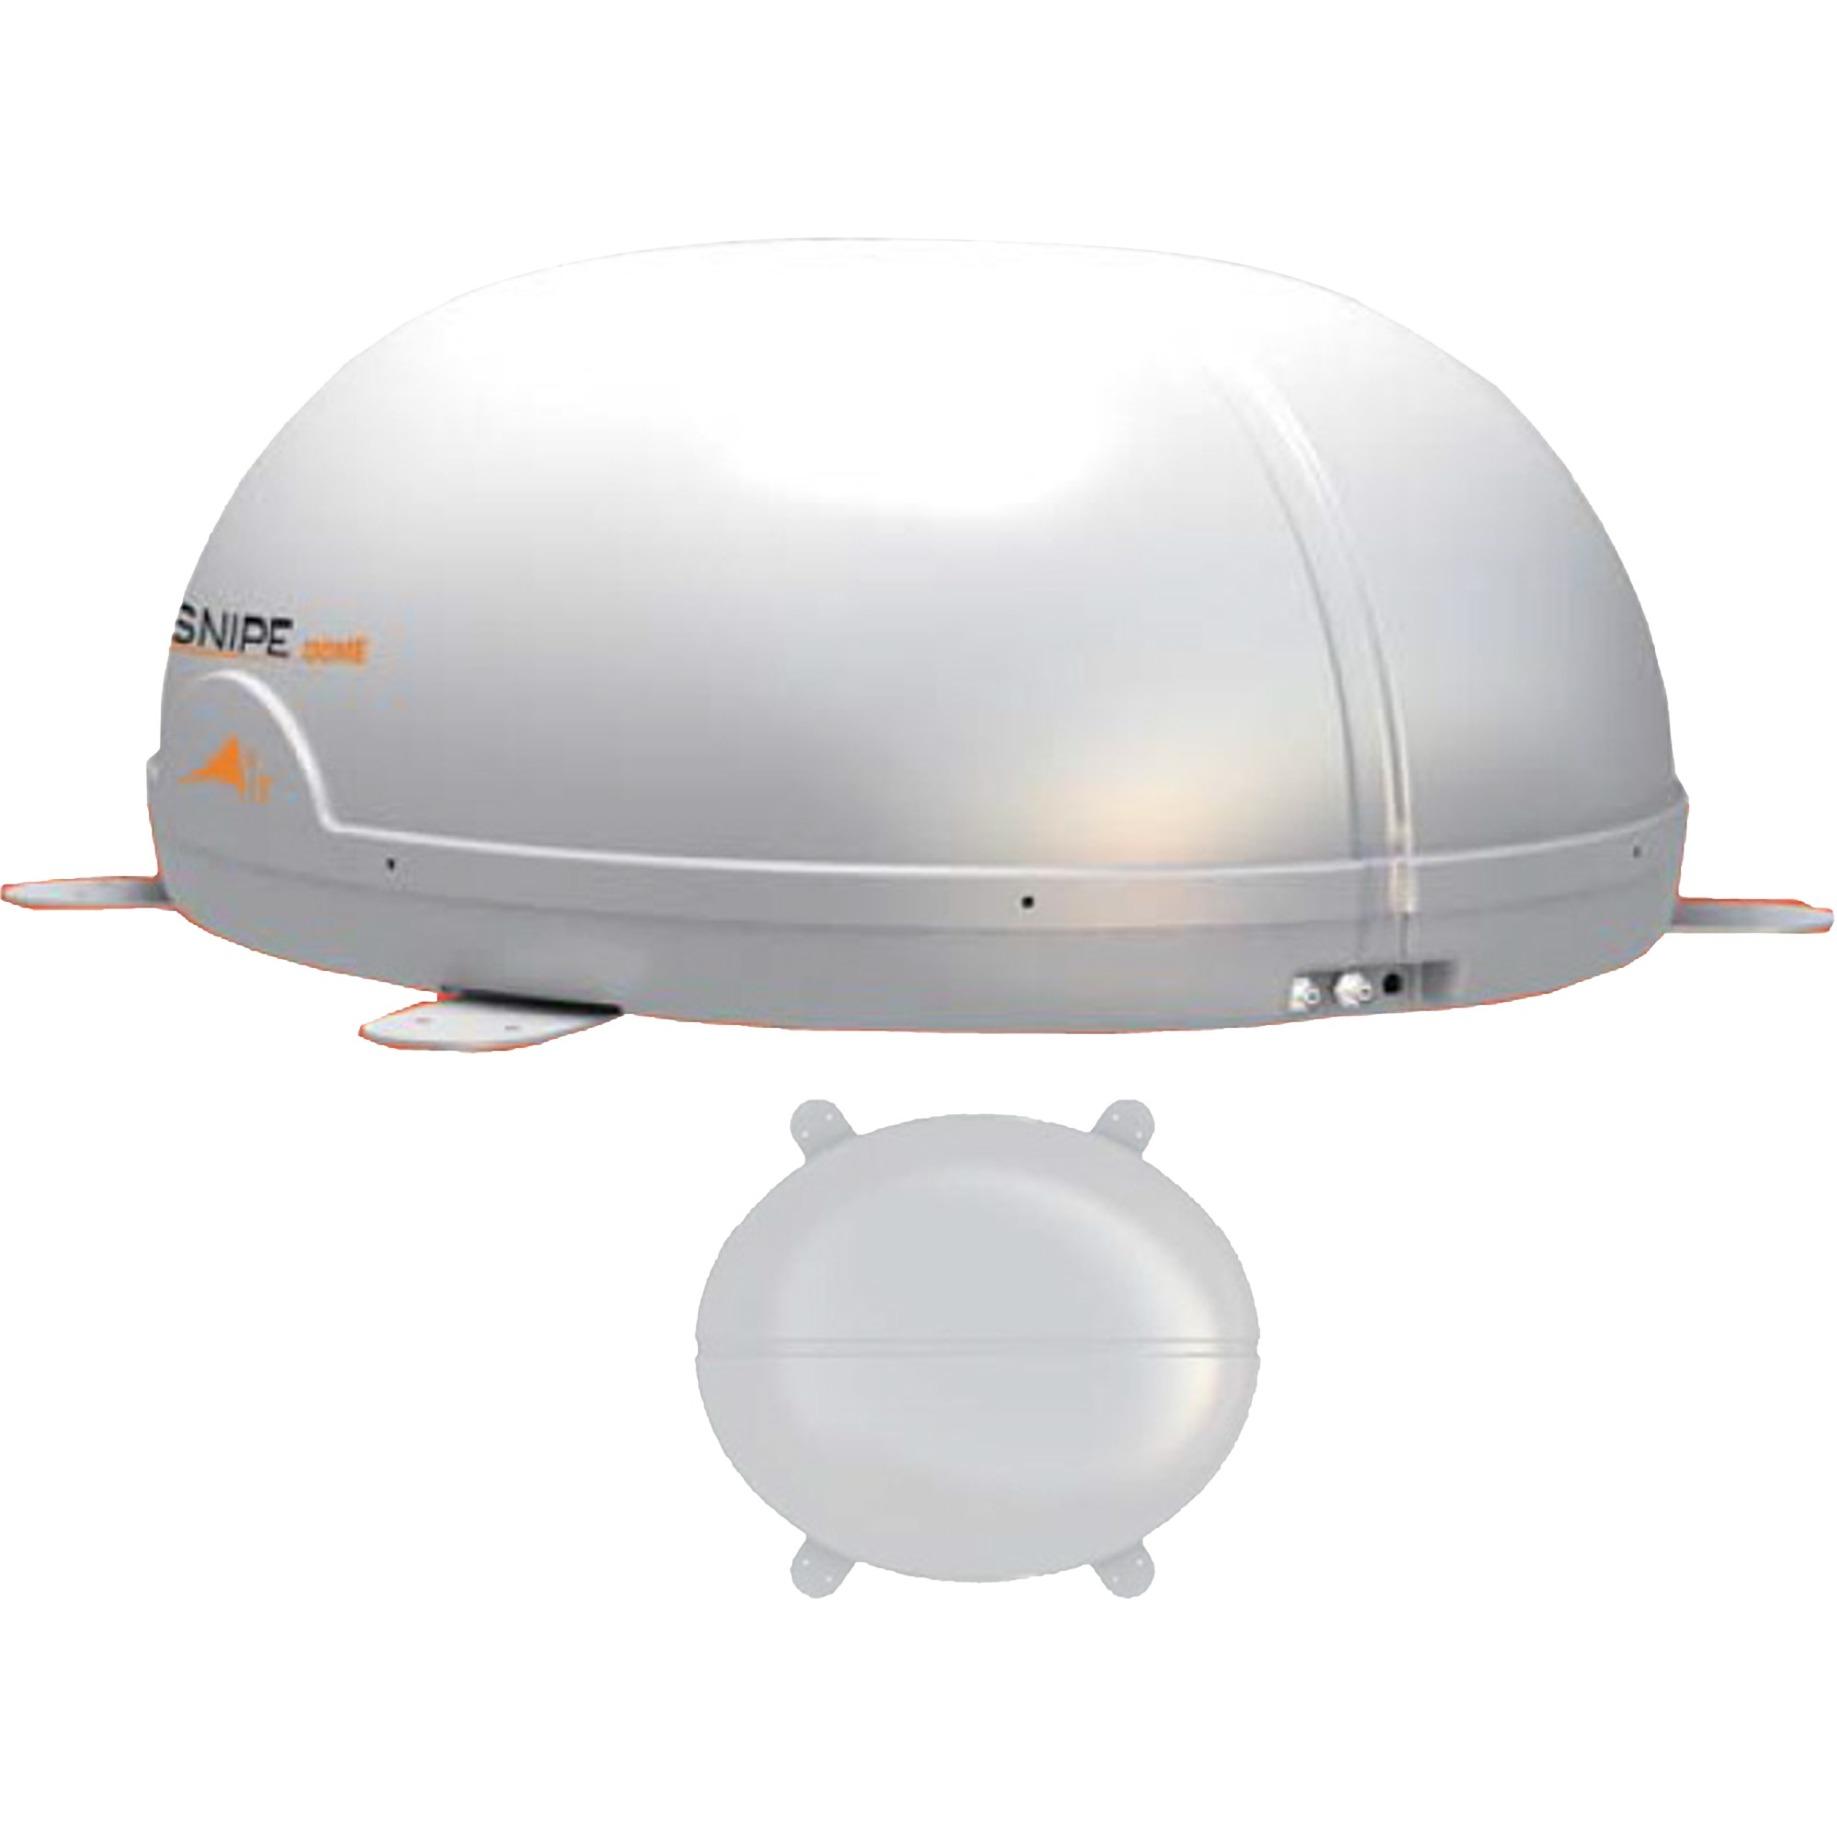 SNIPE DOME-OV, Antenne parabolique